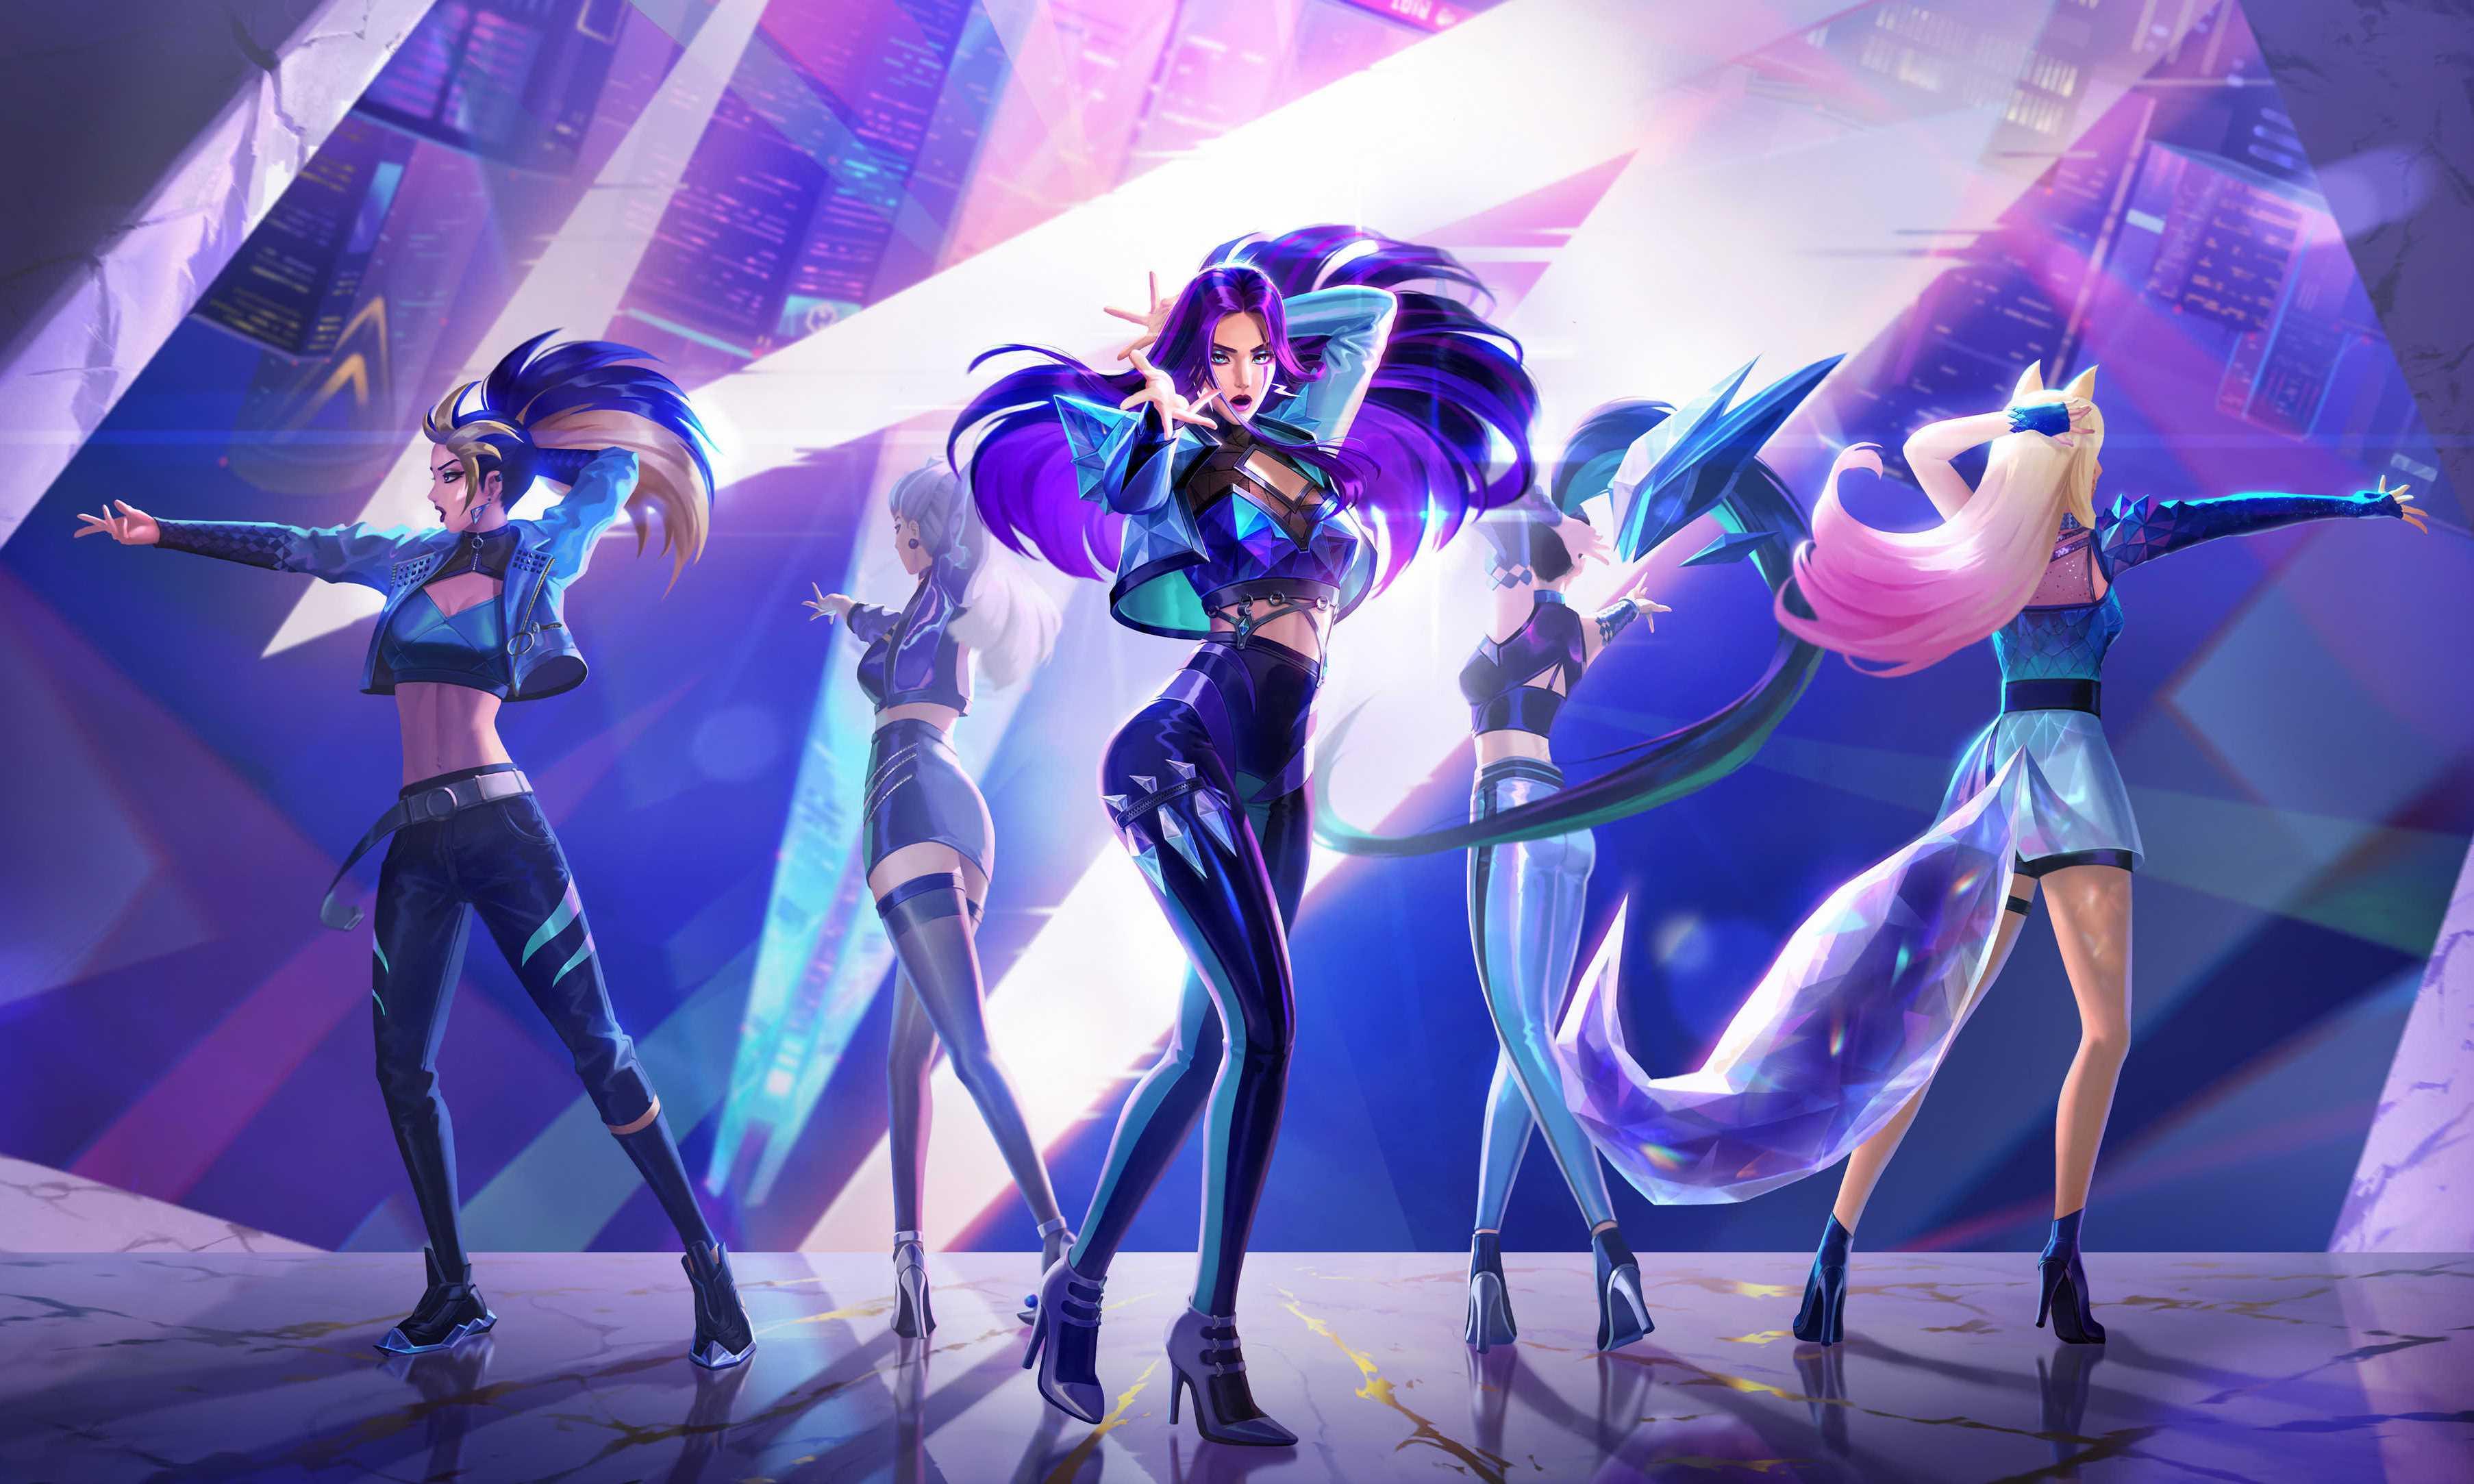 4k Wallpaper League Of Legends Ahri Akali Evelynn Kai'sa Seraphine K_Da